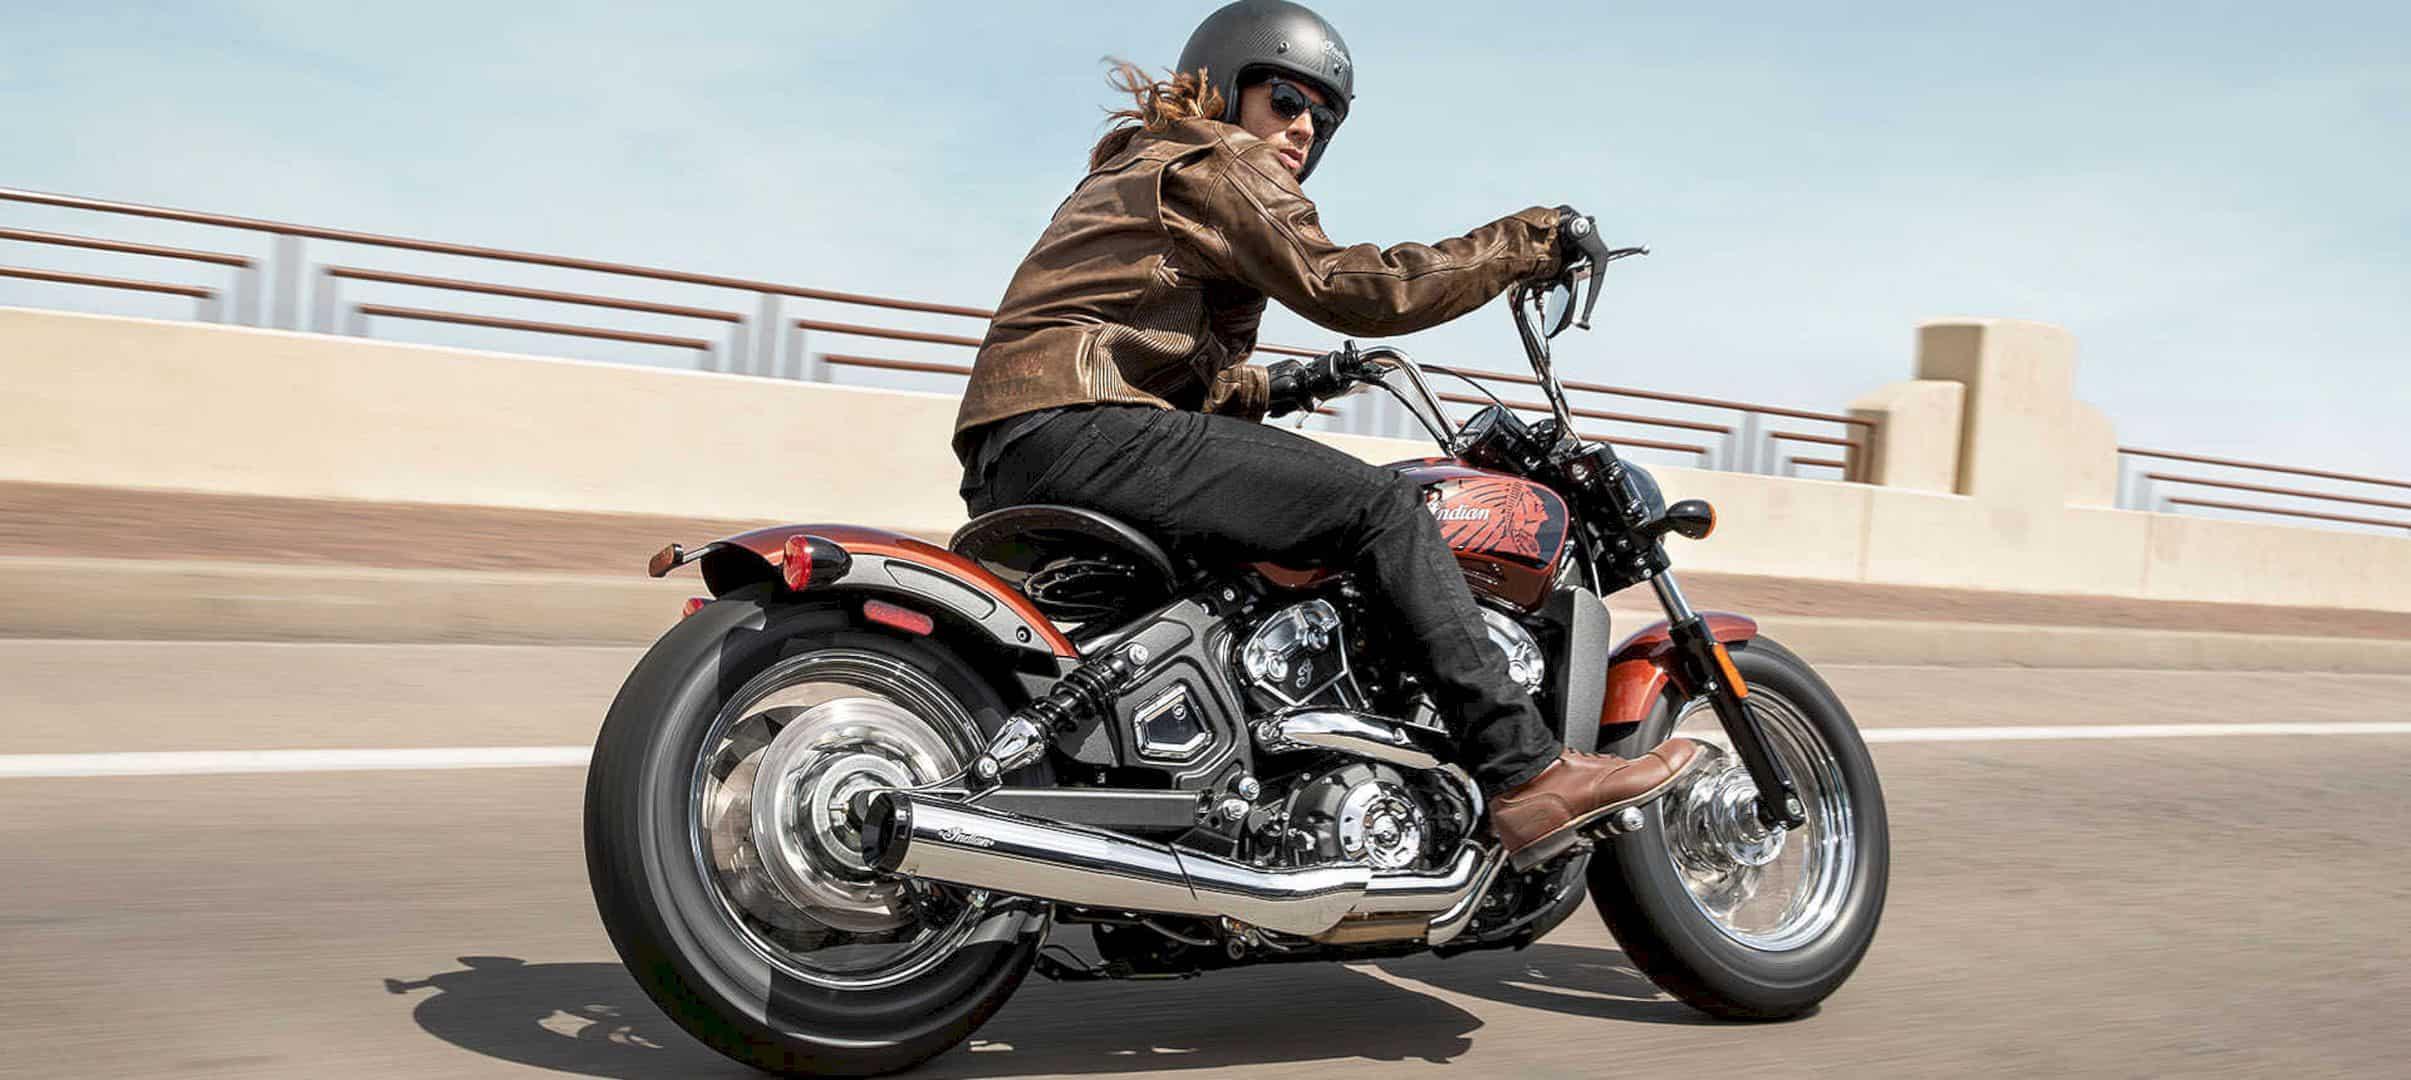 Indian Scout Bobber Twenty Motorcycle 4